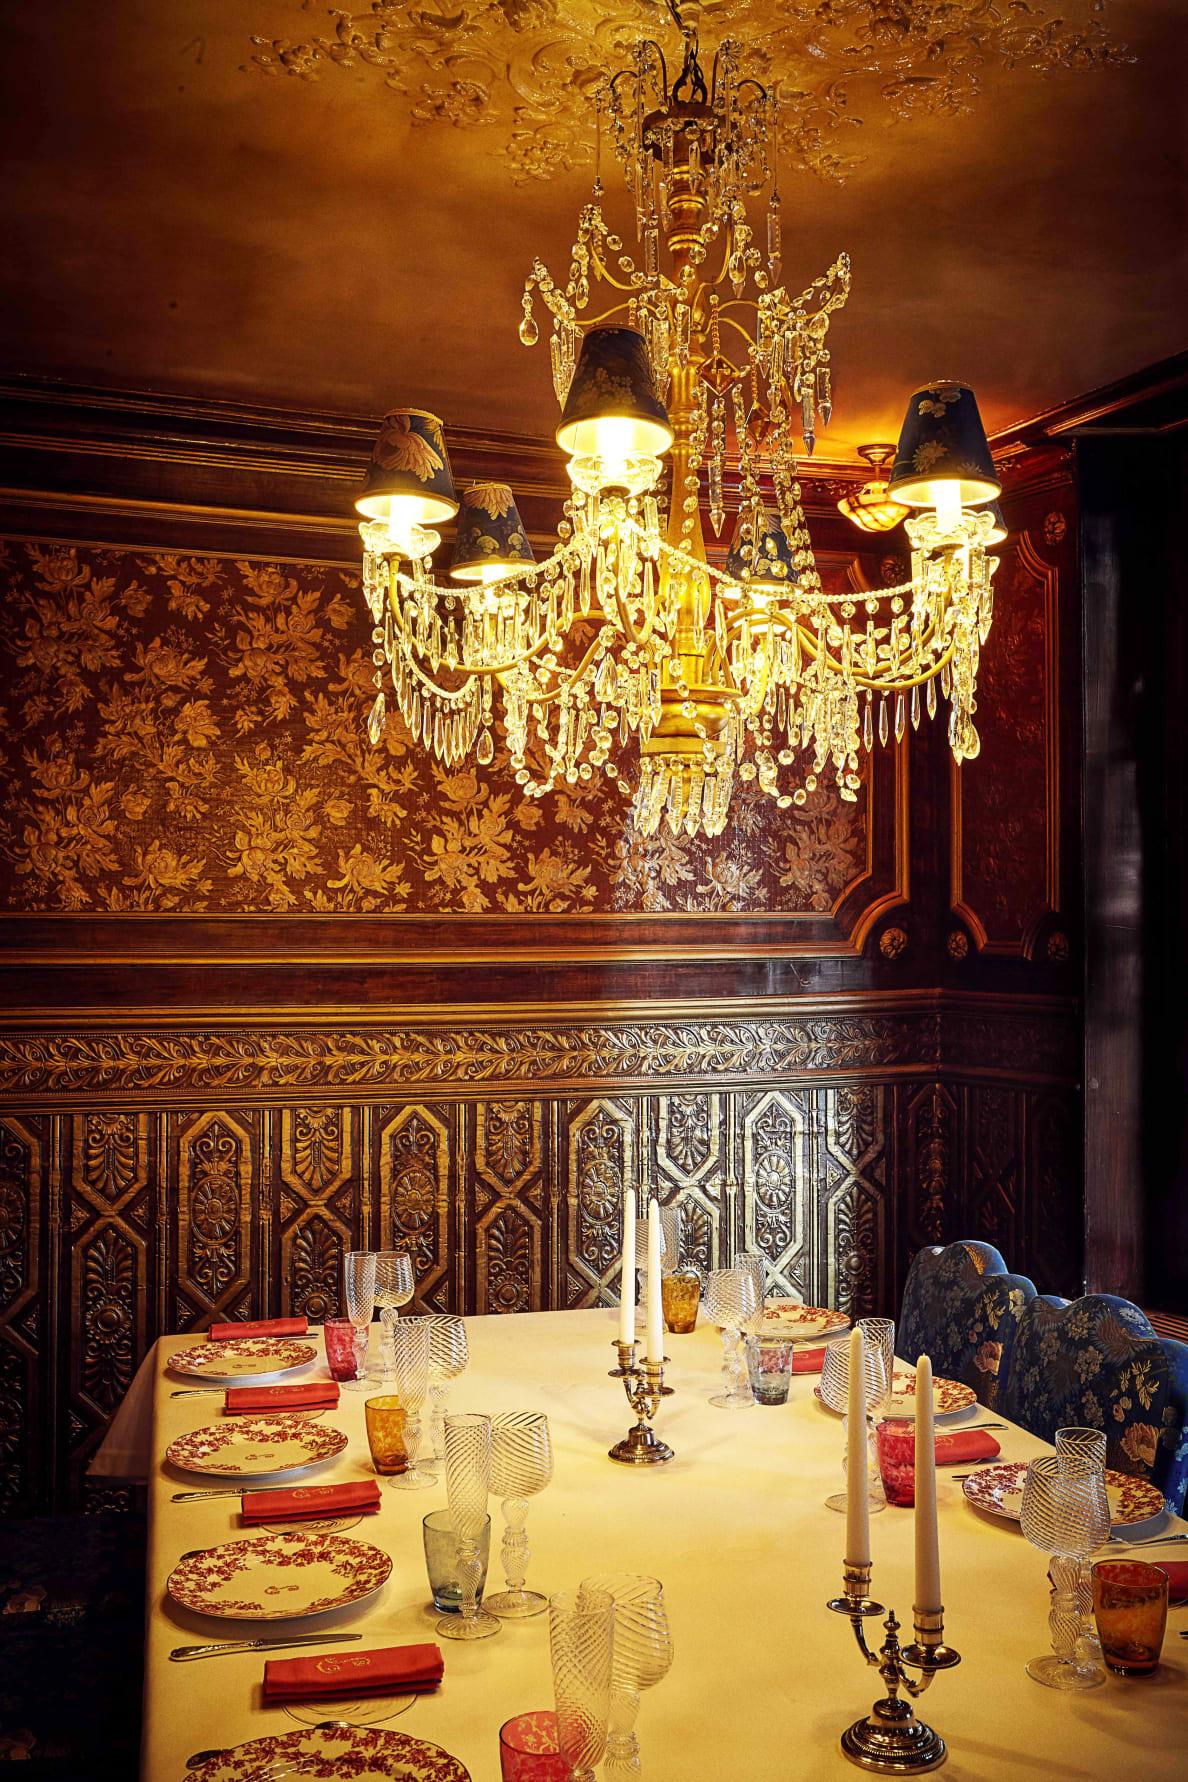 190728-Zaleski-paris-sex-restaurant-embed-4_kdpwur